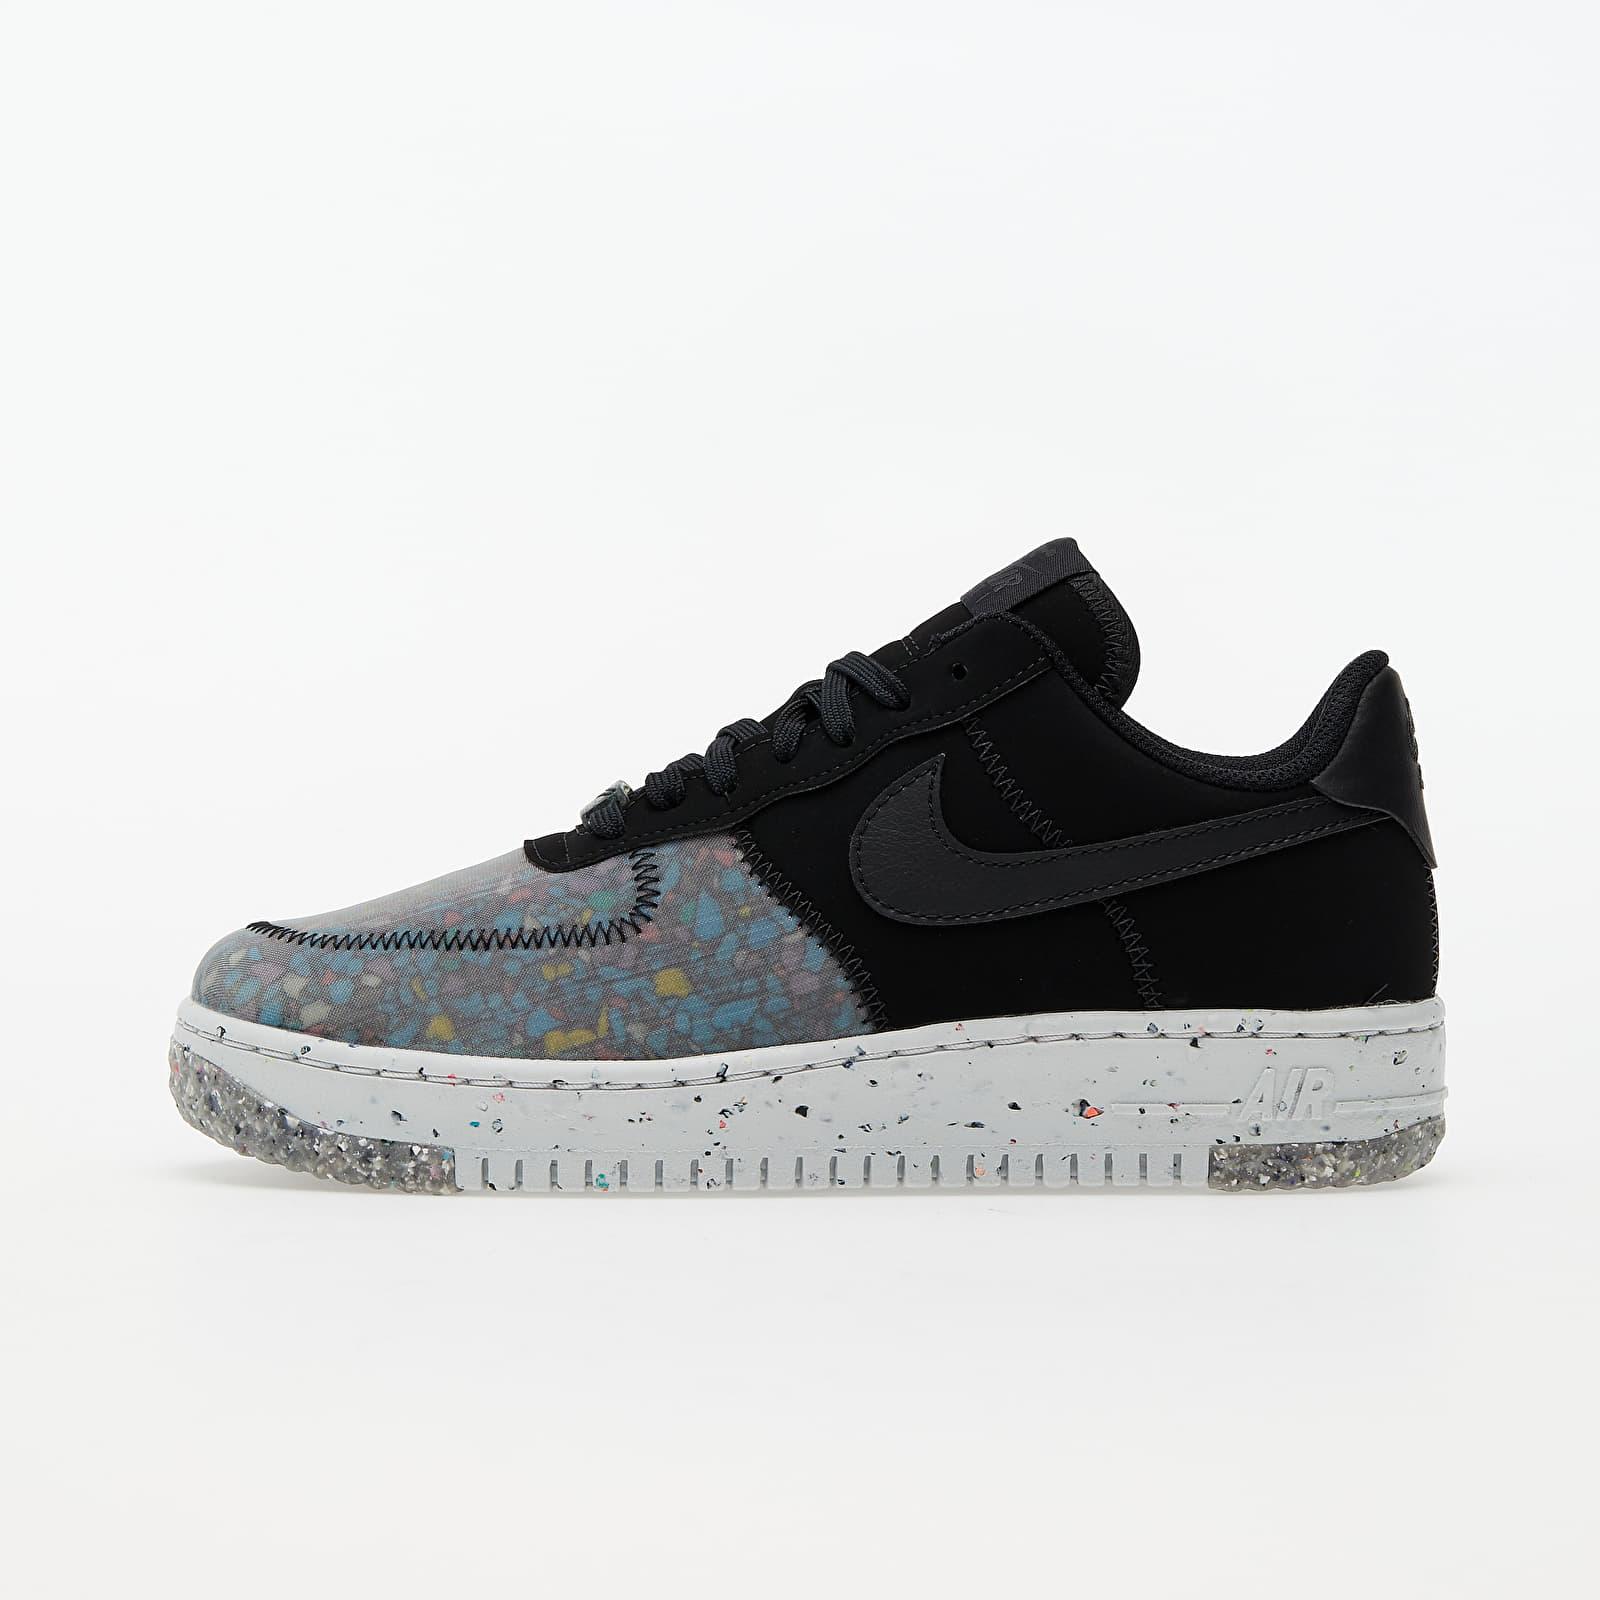 Ženske tenisice Nike W Air Force 1 Crater Black/ Black-Photon Dust-Dk Smoke Grey